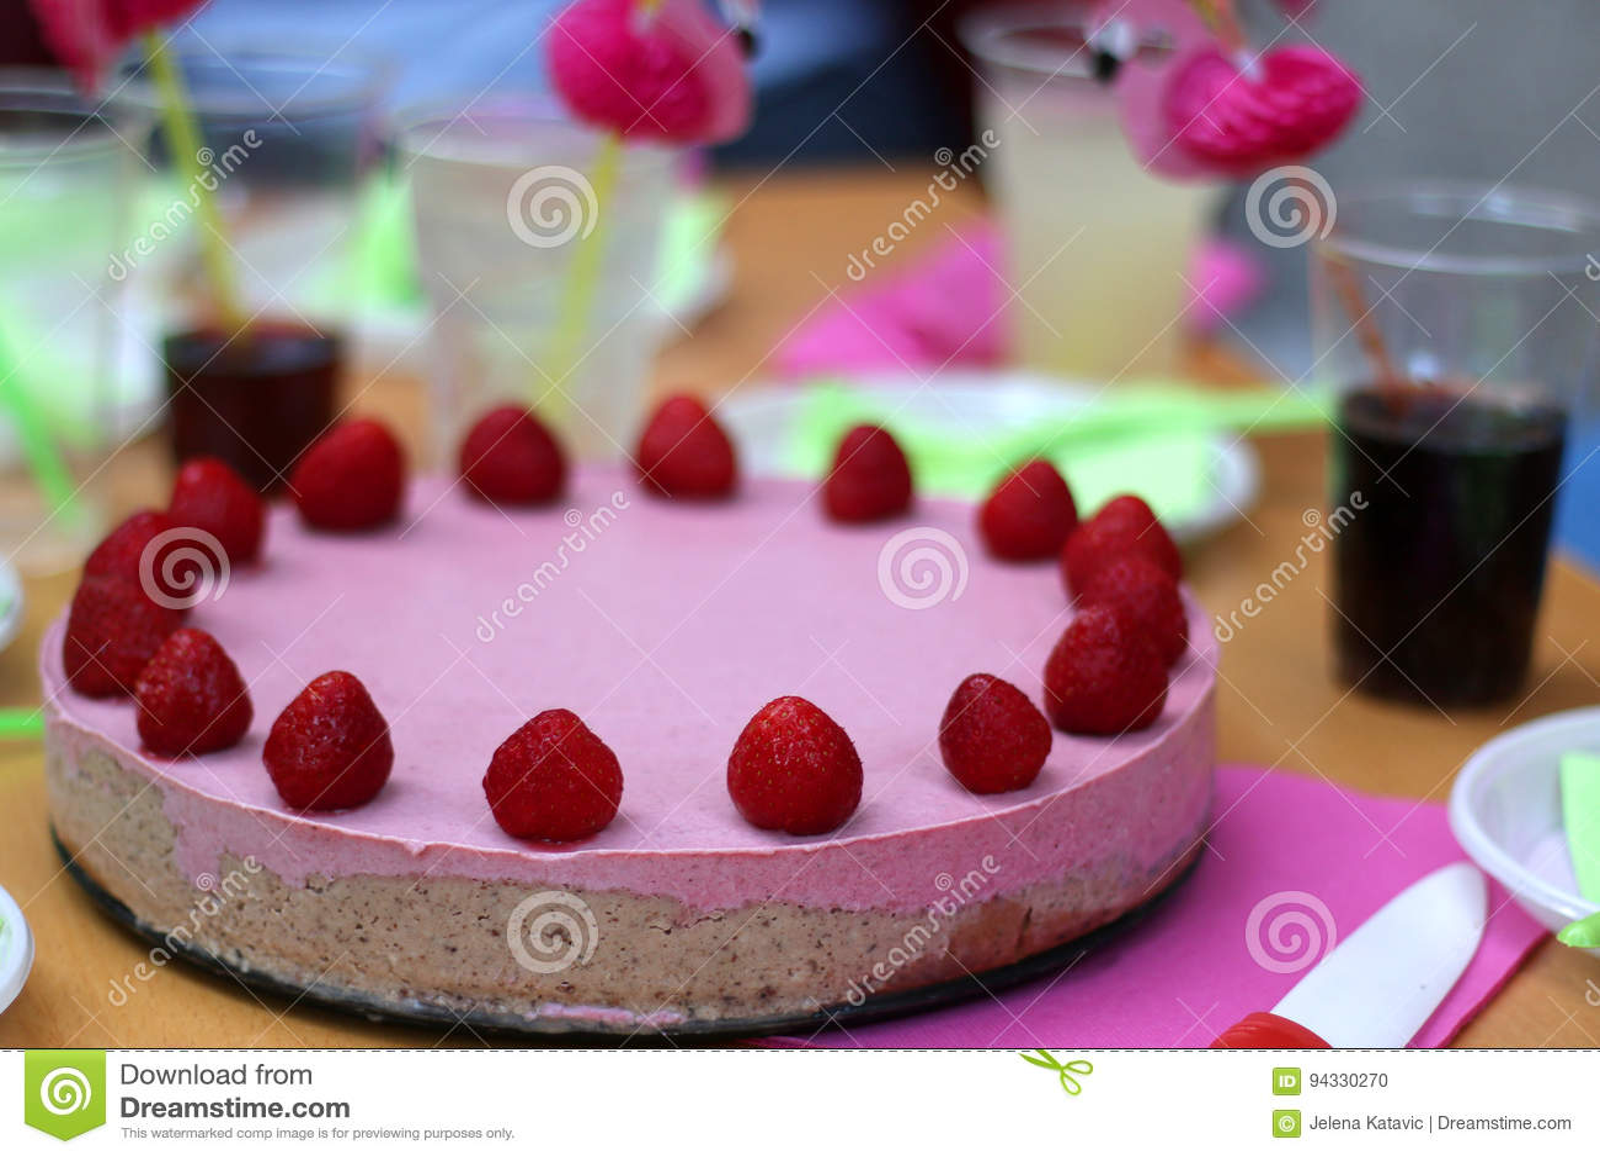 Birthday Cake Stock Photo Image Of Cocoa Depth Napkin 94330270